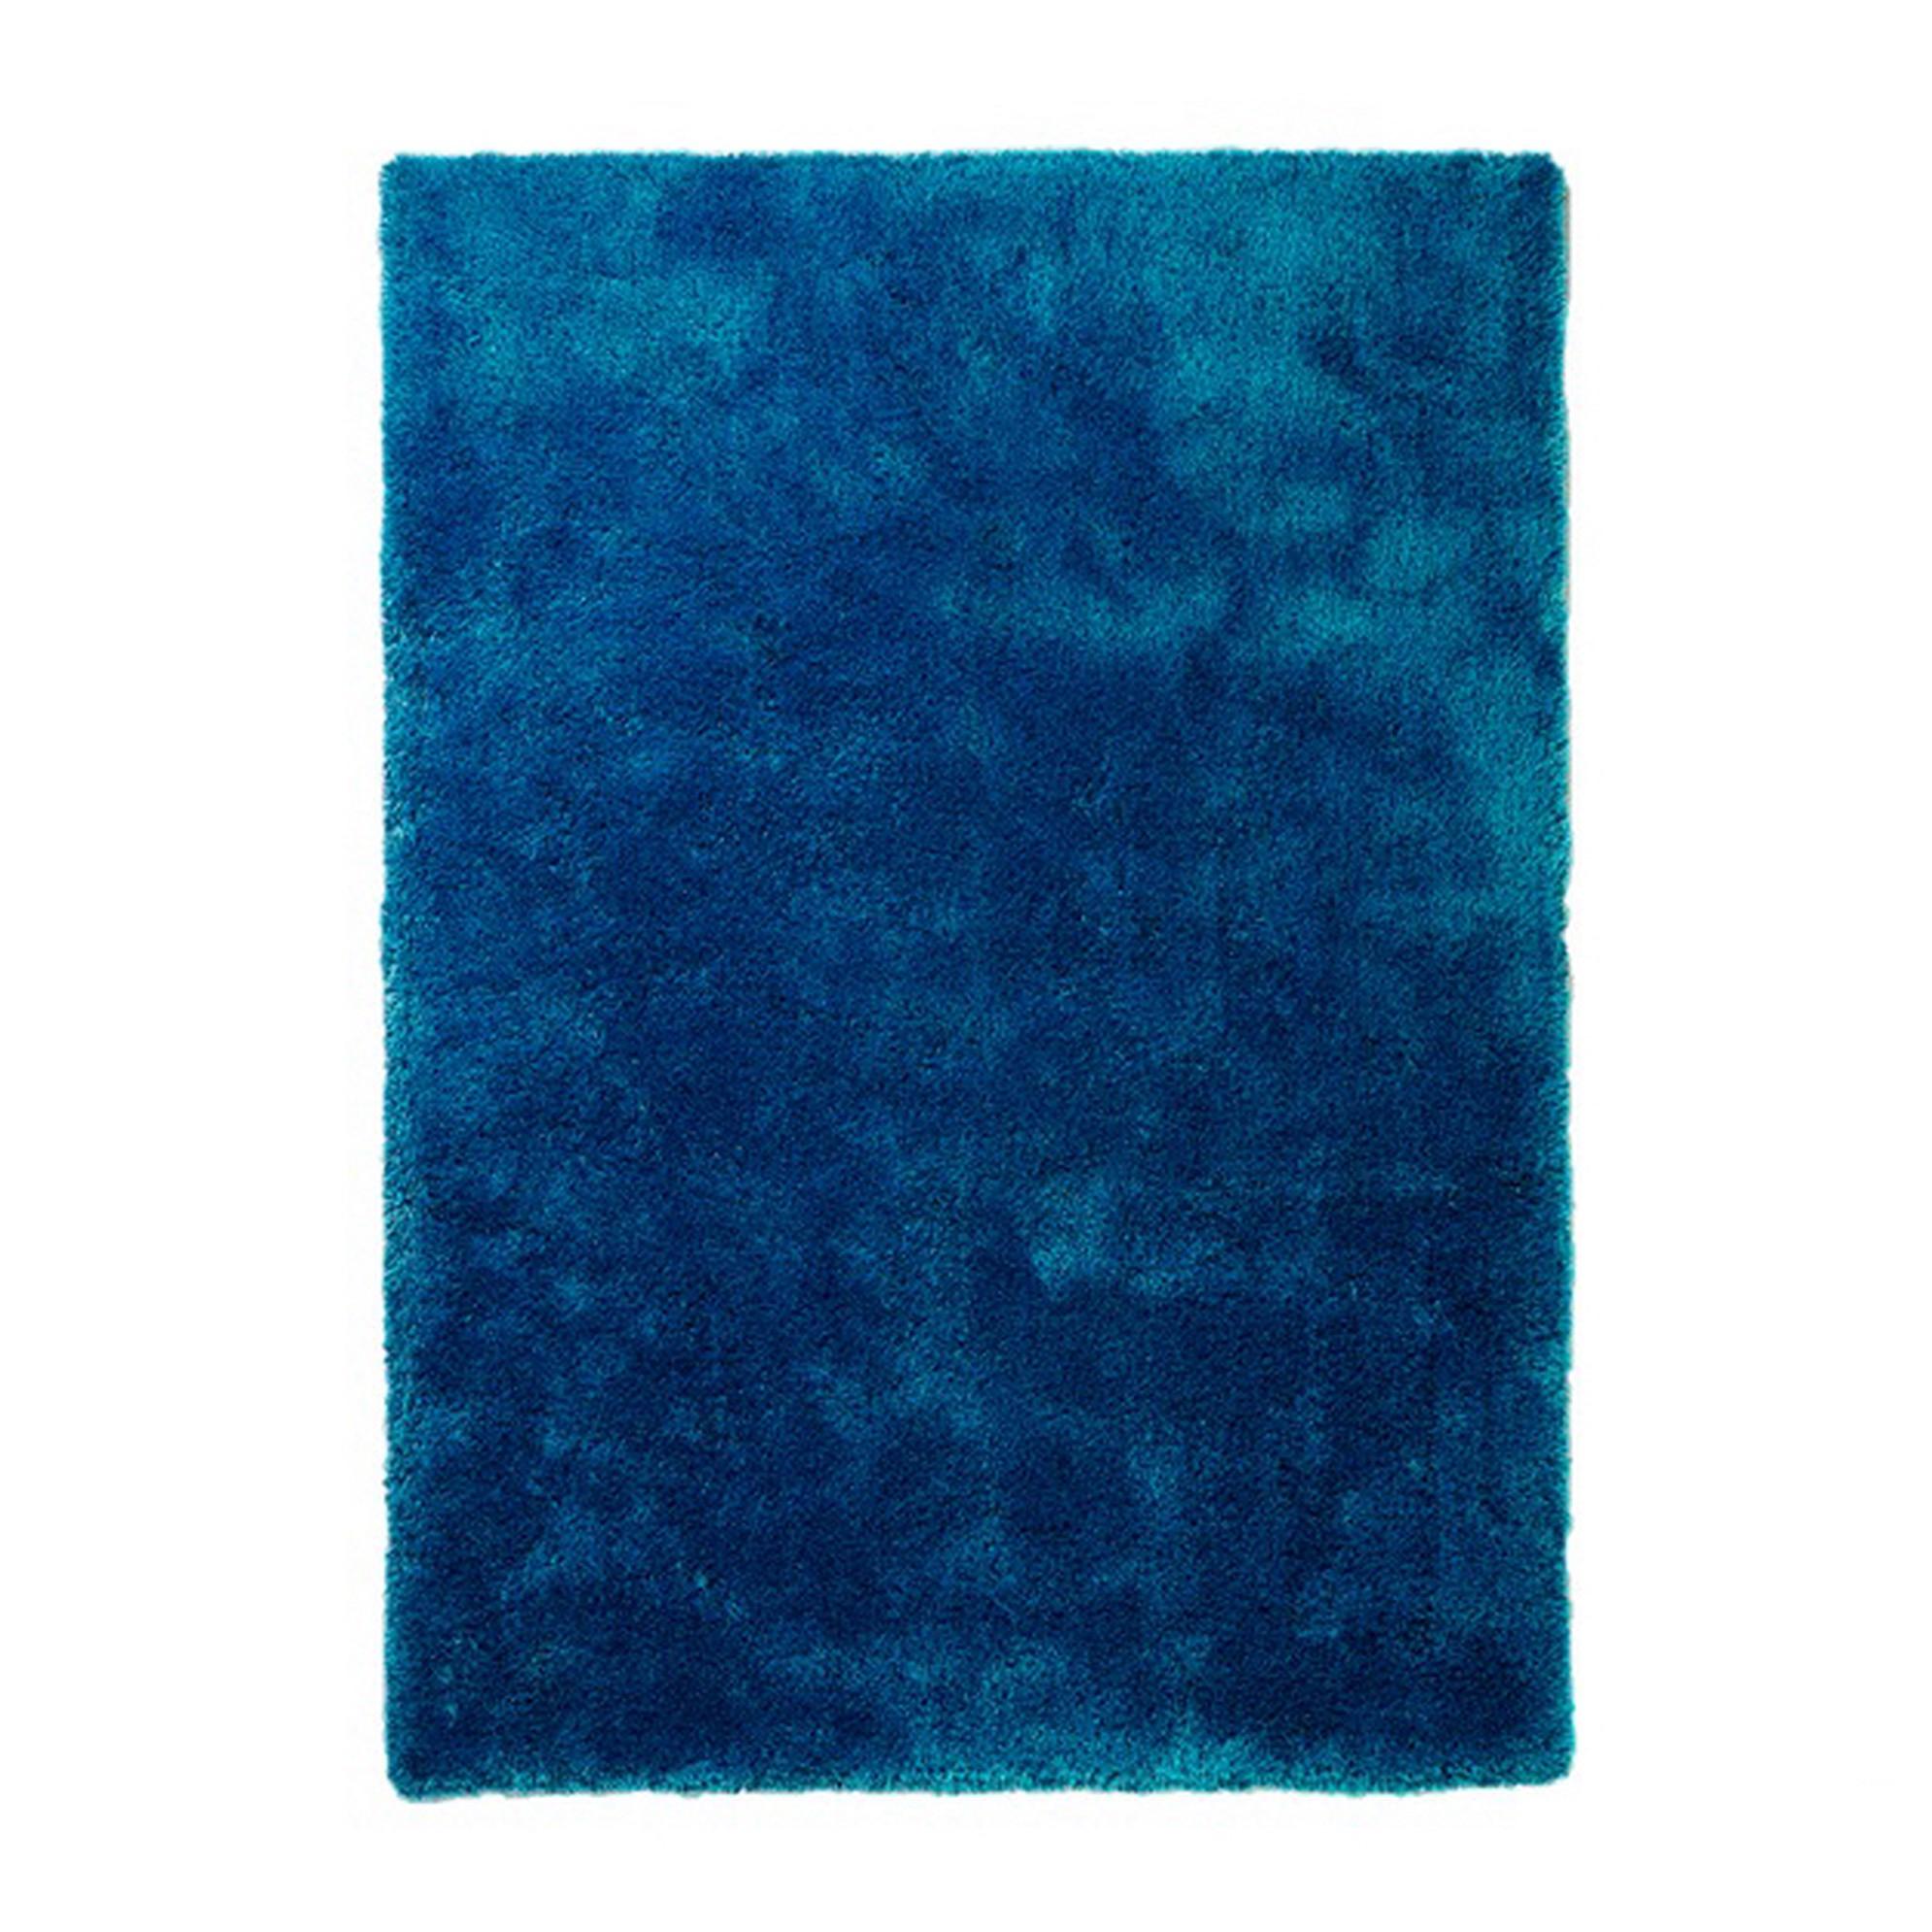 janosch teppich cheap neu kinder bett janosch emil grnbr bettwsche gebraucht kaufen leipzig. Black Bedroom Furniture Sets. Home Design Ideas